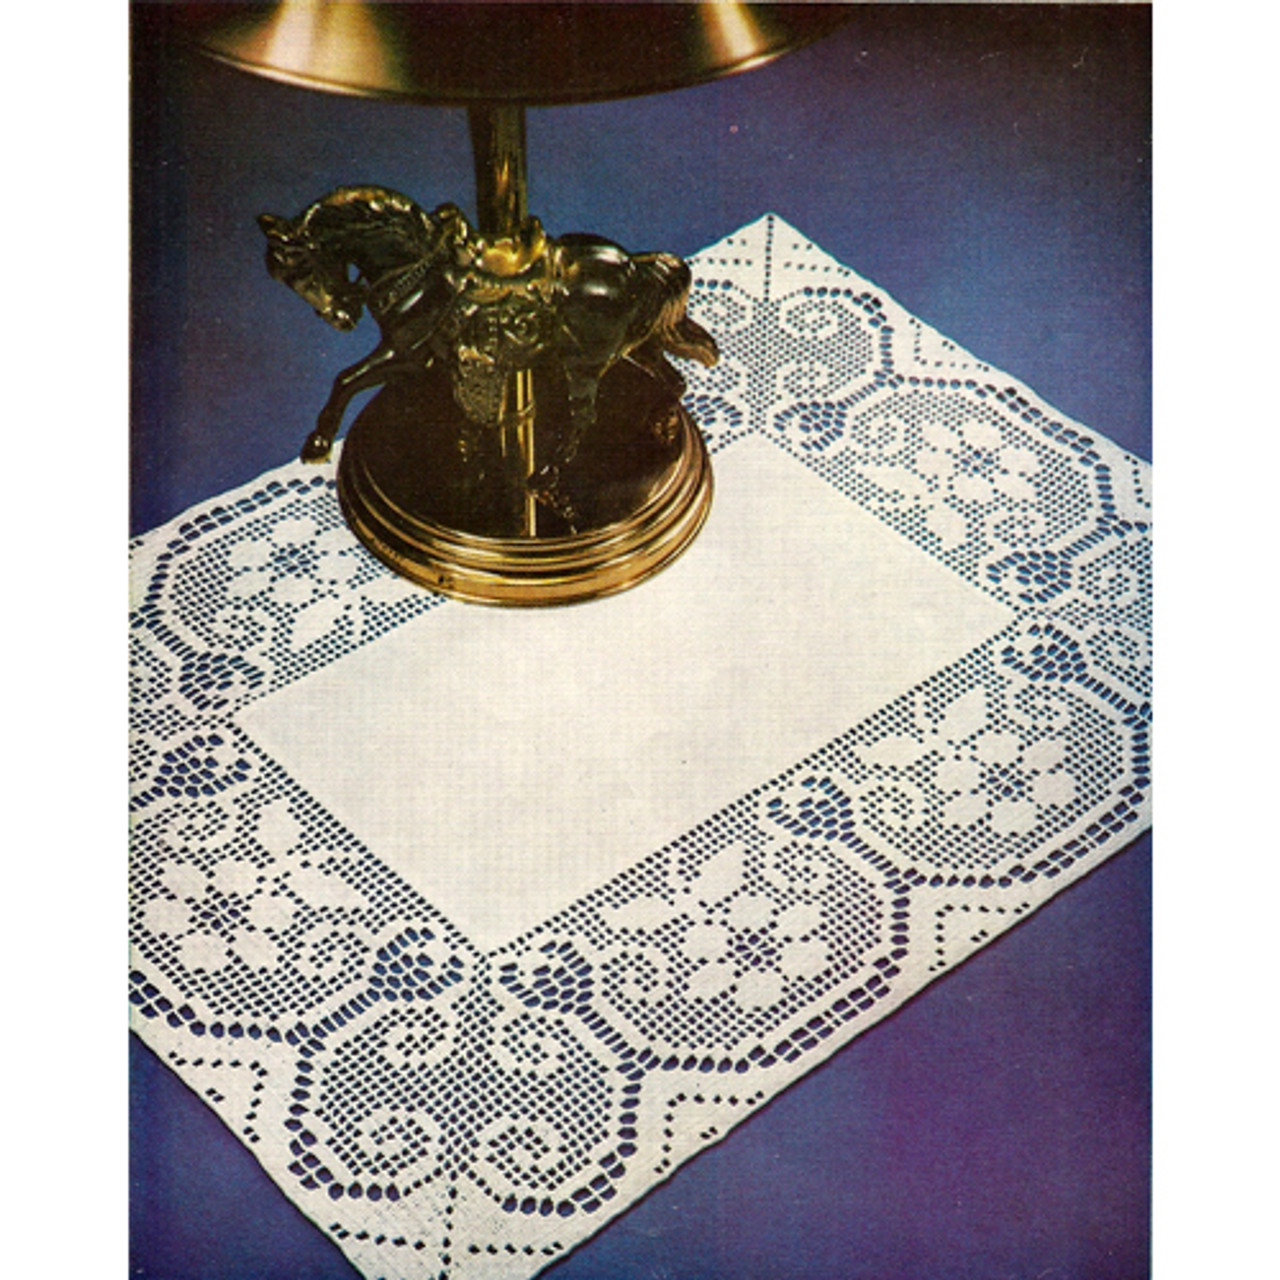 Filet Crochet Border for Linen Centerpiece Doily Pattern